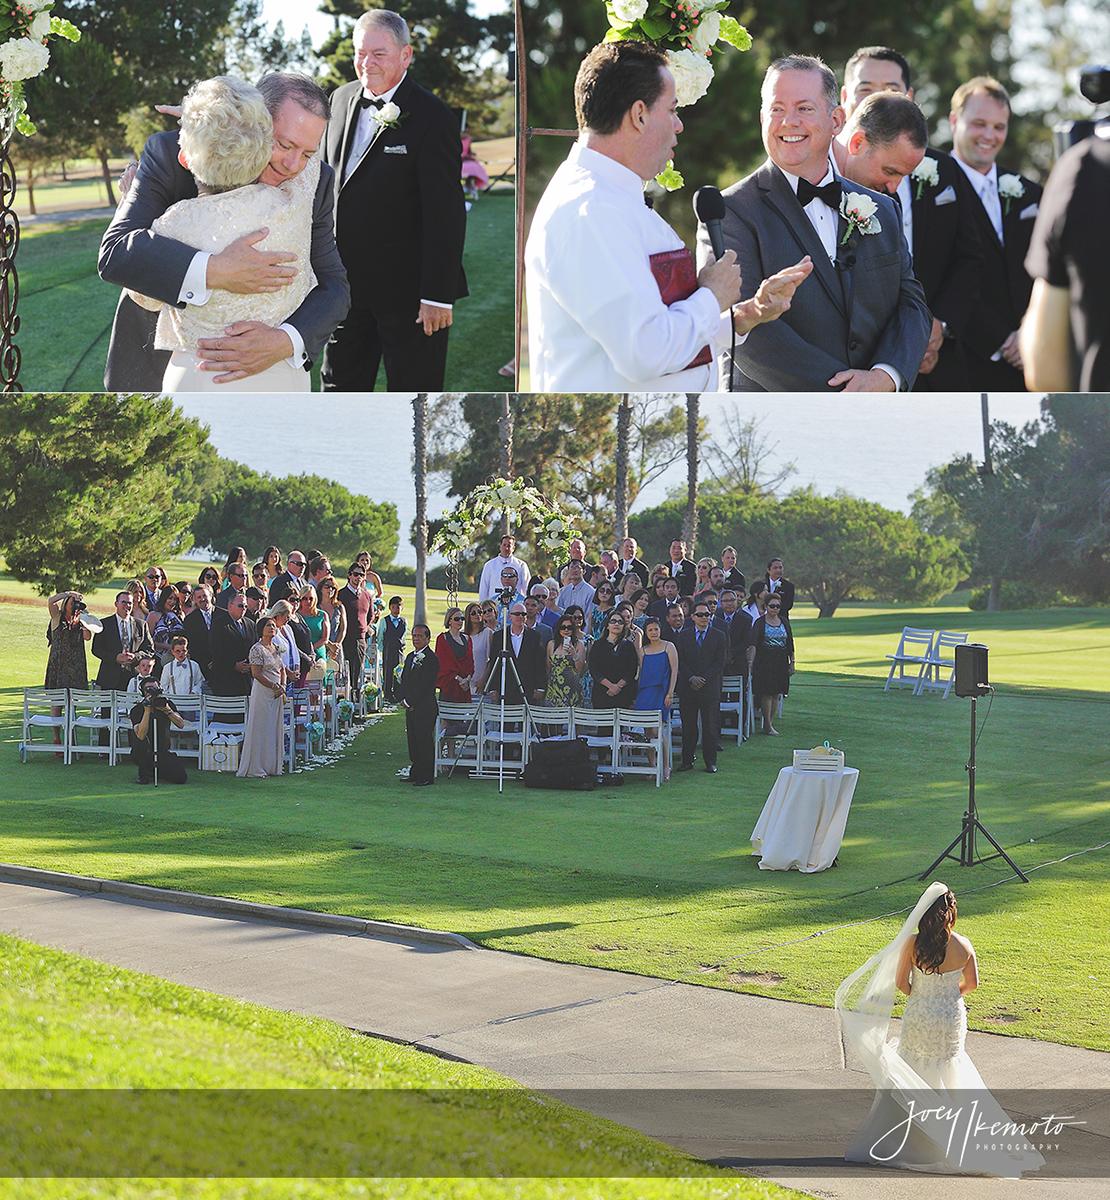 Terrena-Resort-Palos-verdes-and-La-Venta-Inn-Wedding_0025_Blog-Collage-1471479195185